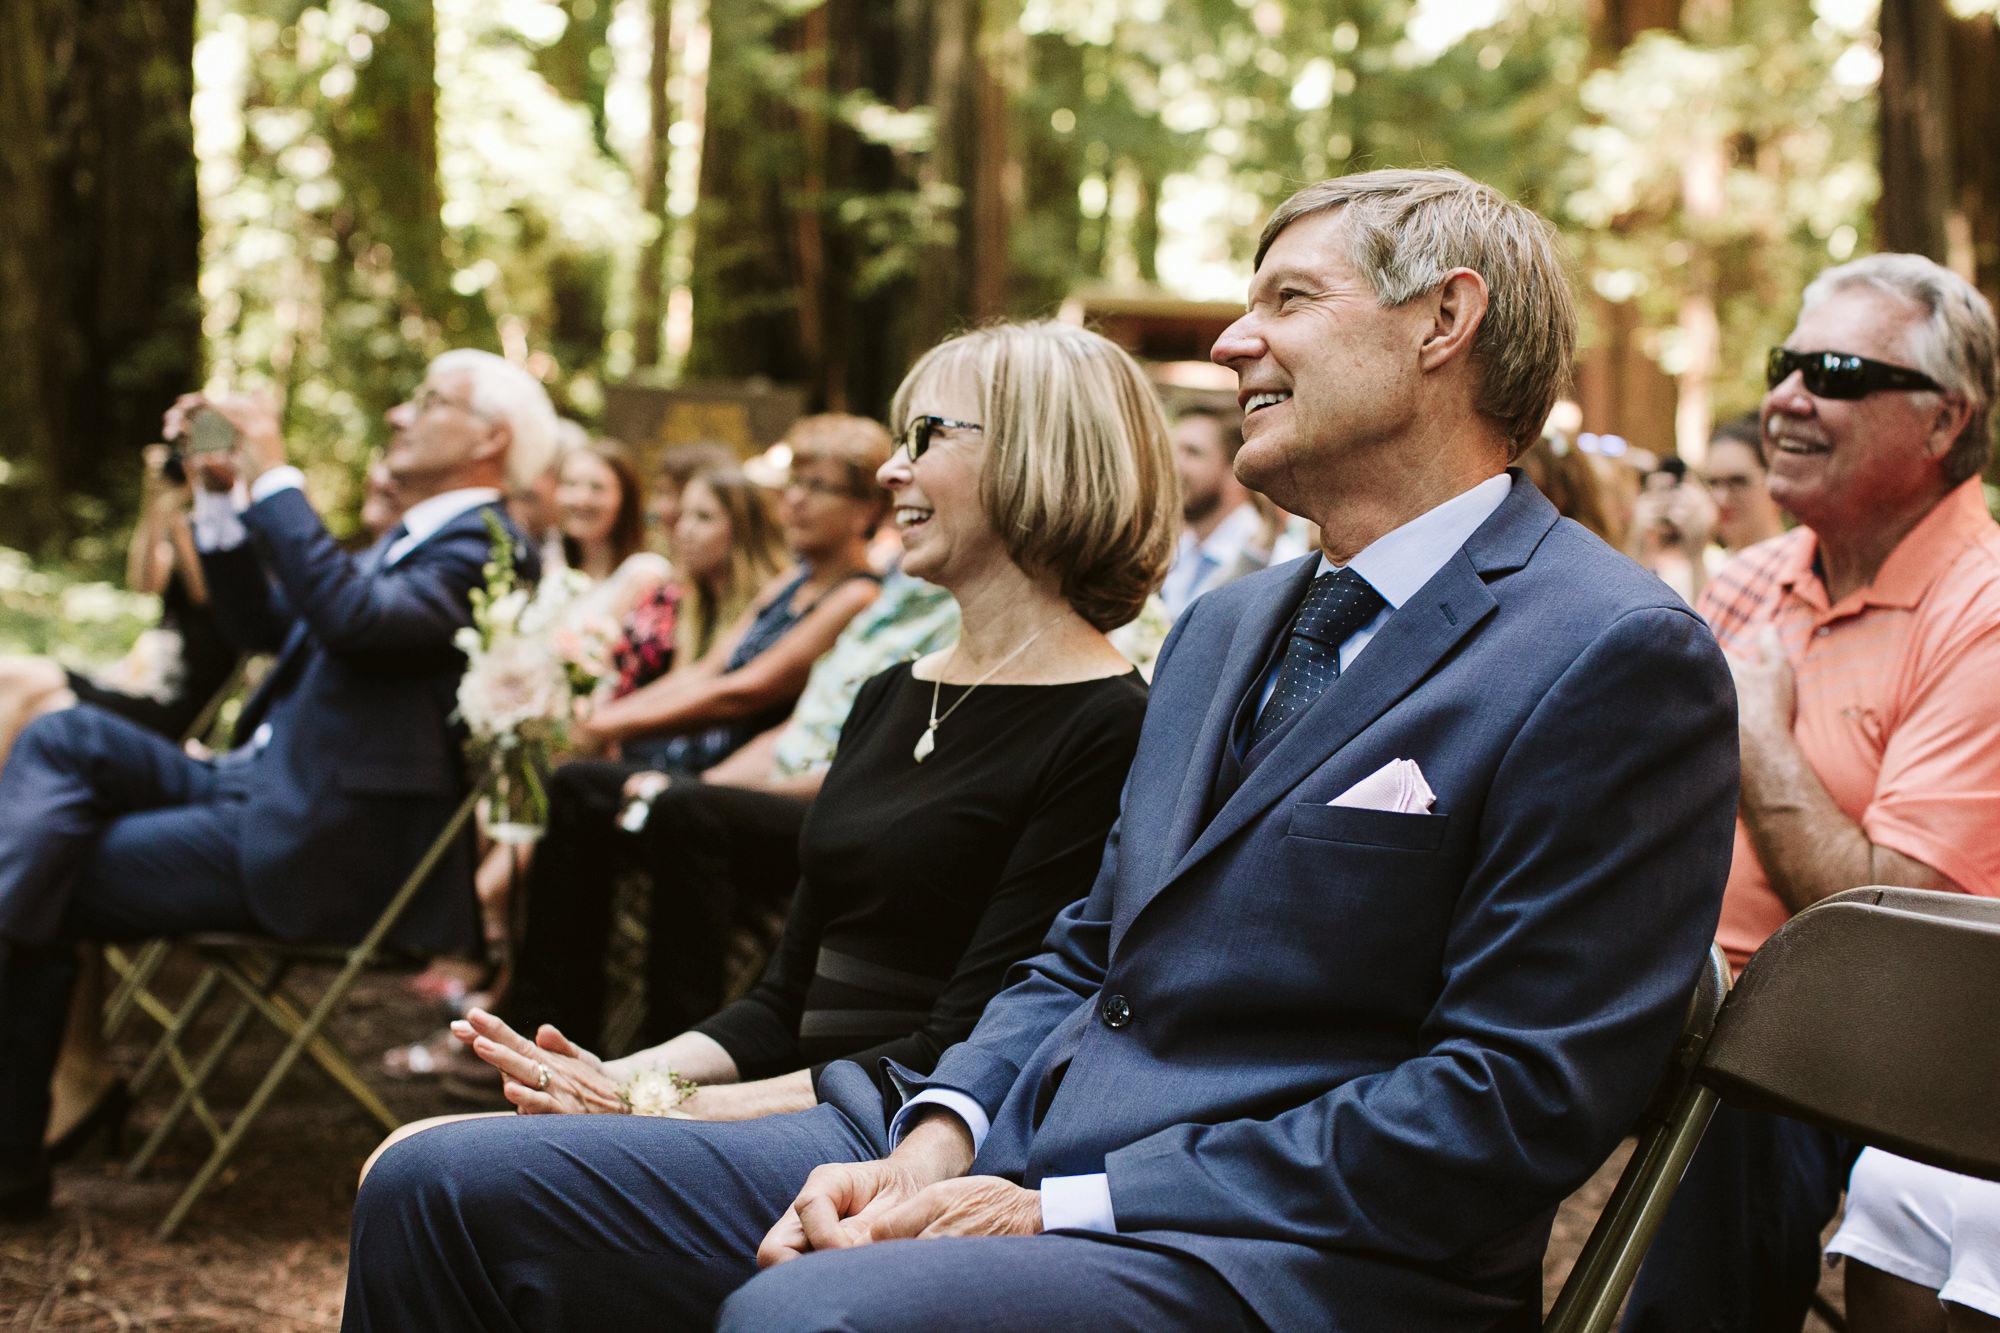 California-wedding-photographer-alfonso-flores-pamplin-groove-183.jpg